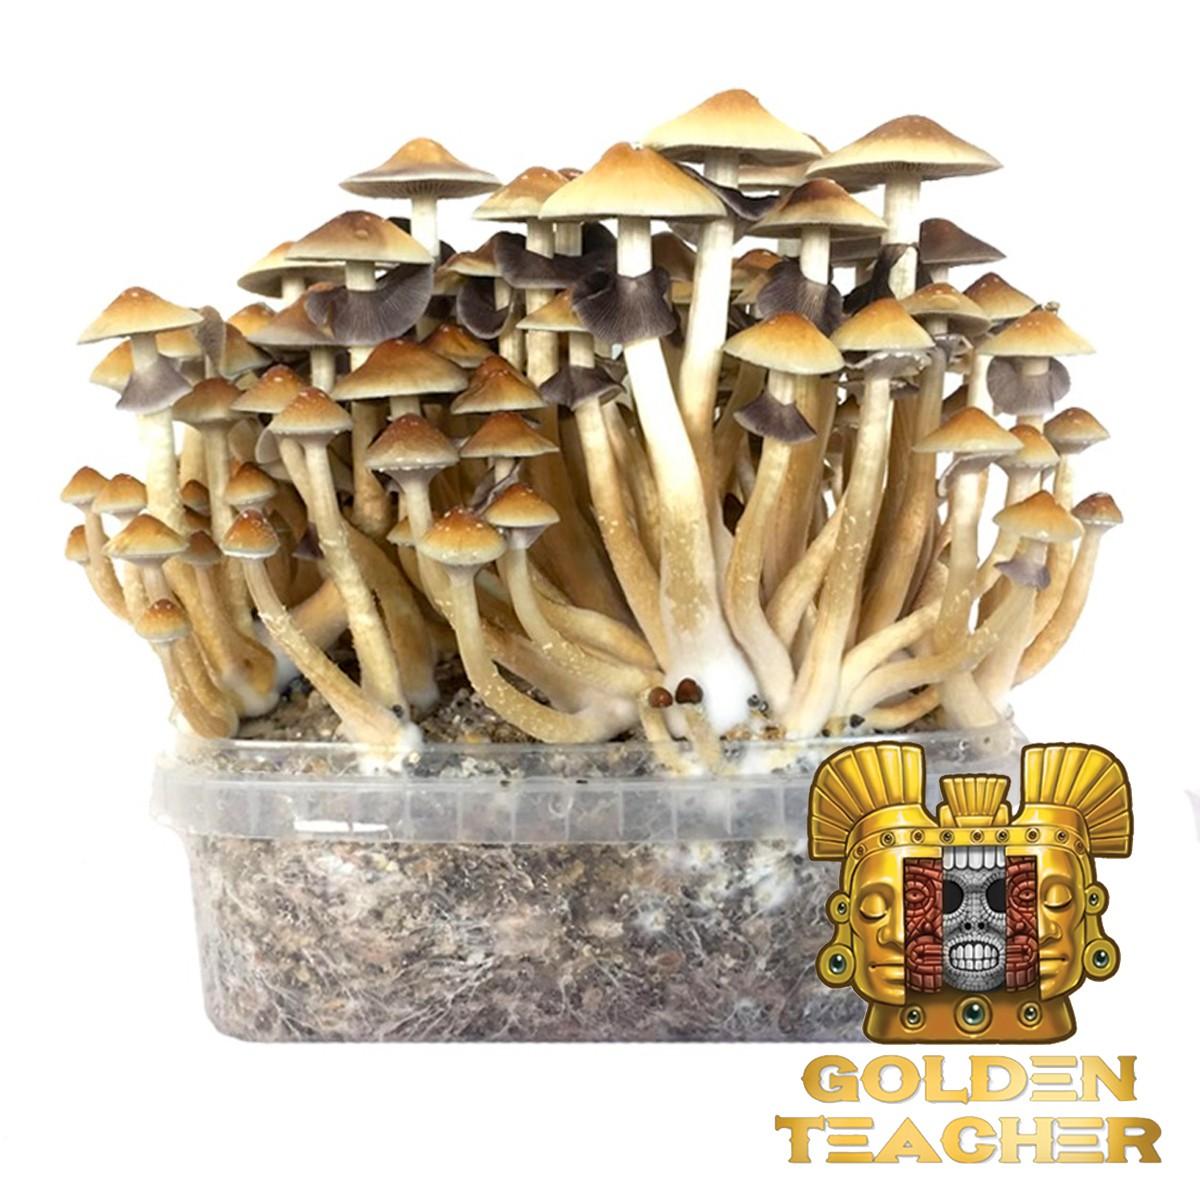 Psilocybe Cubensis Golden Teacher - Magic Mushroom Grow Kit 27,95 € Magic Mushroom Growkits